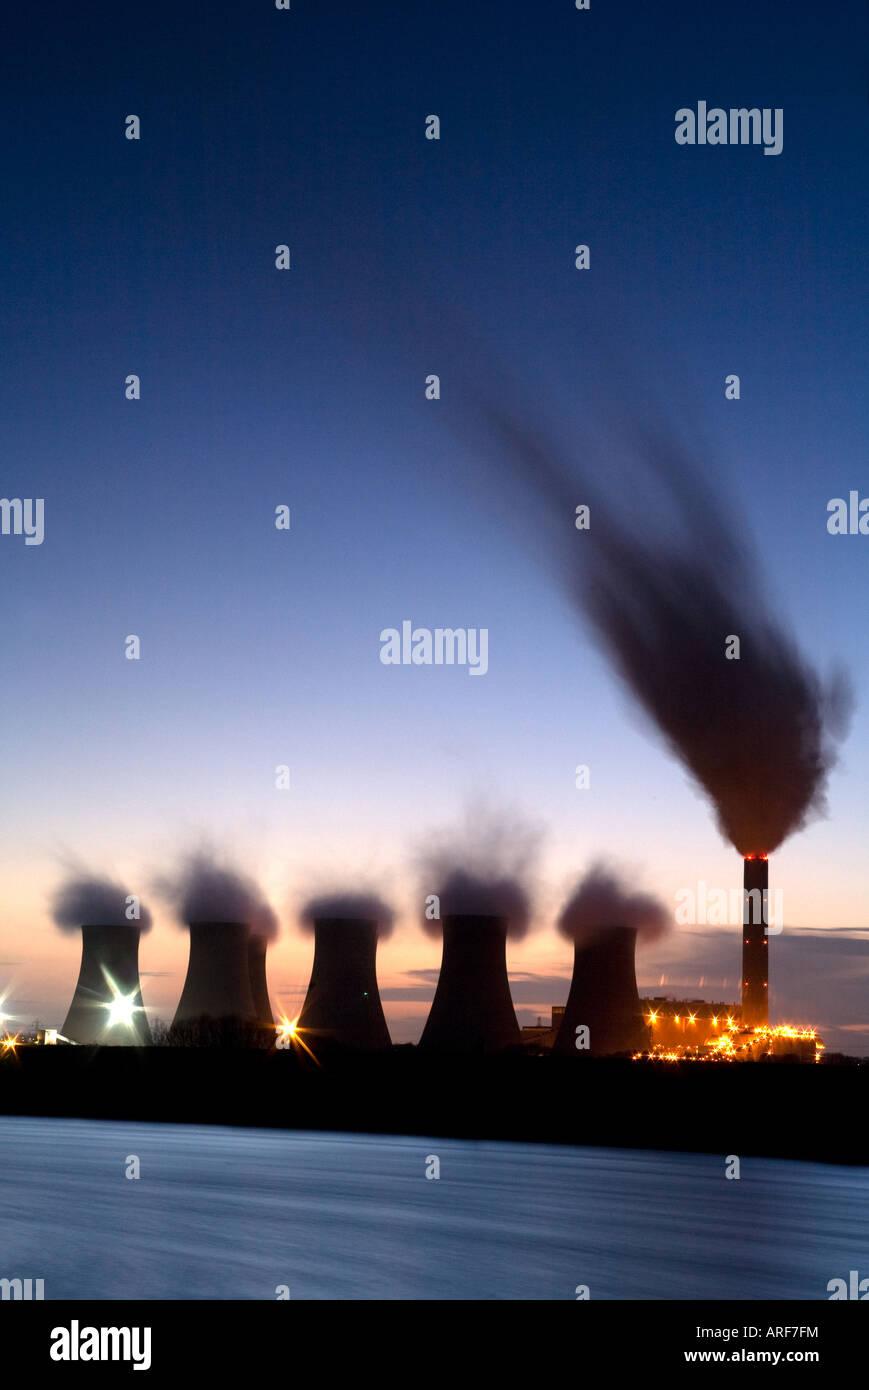 Cottam Coal fired Power Station on River Trent England - Stock Image